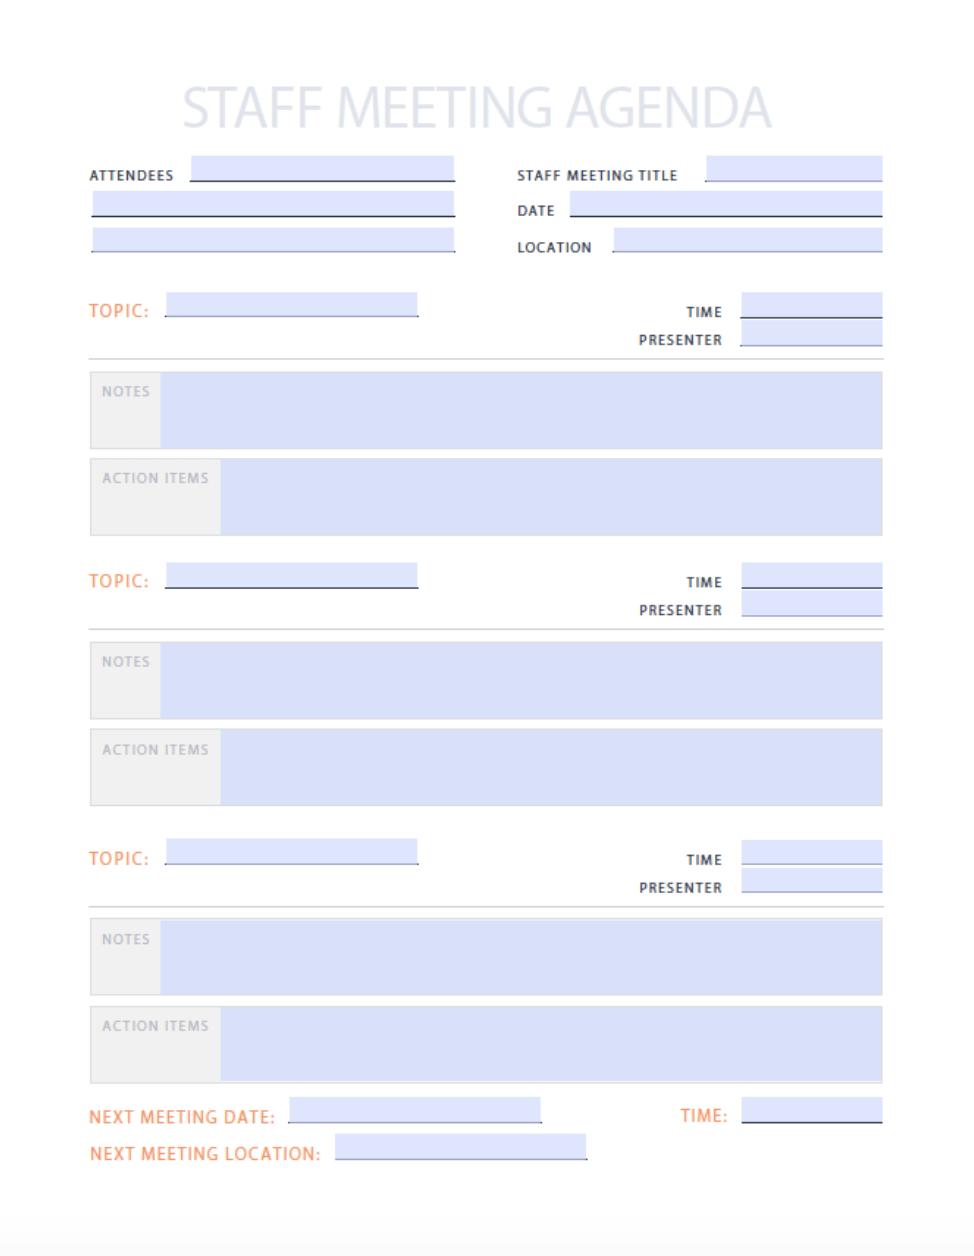 Sample board meeting agenda template. 9 Free Agendas Schedules Templates Examples Hubspot